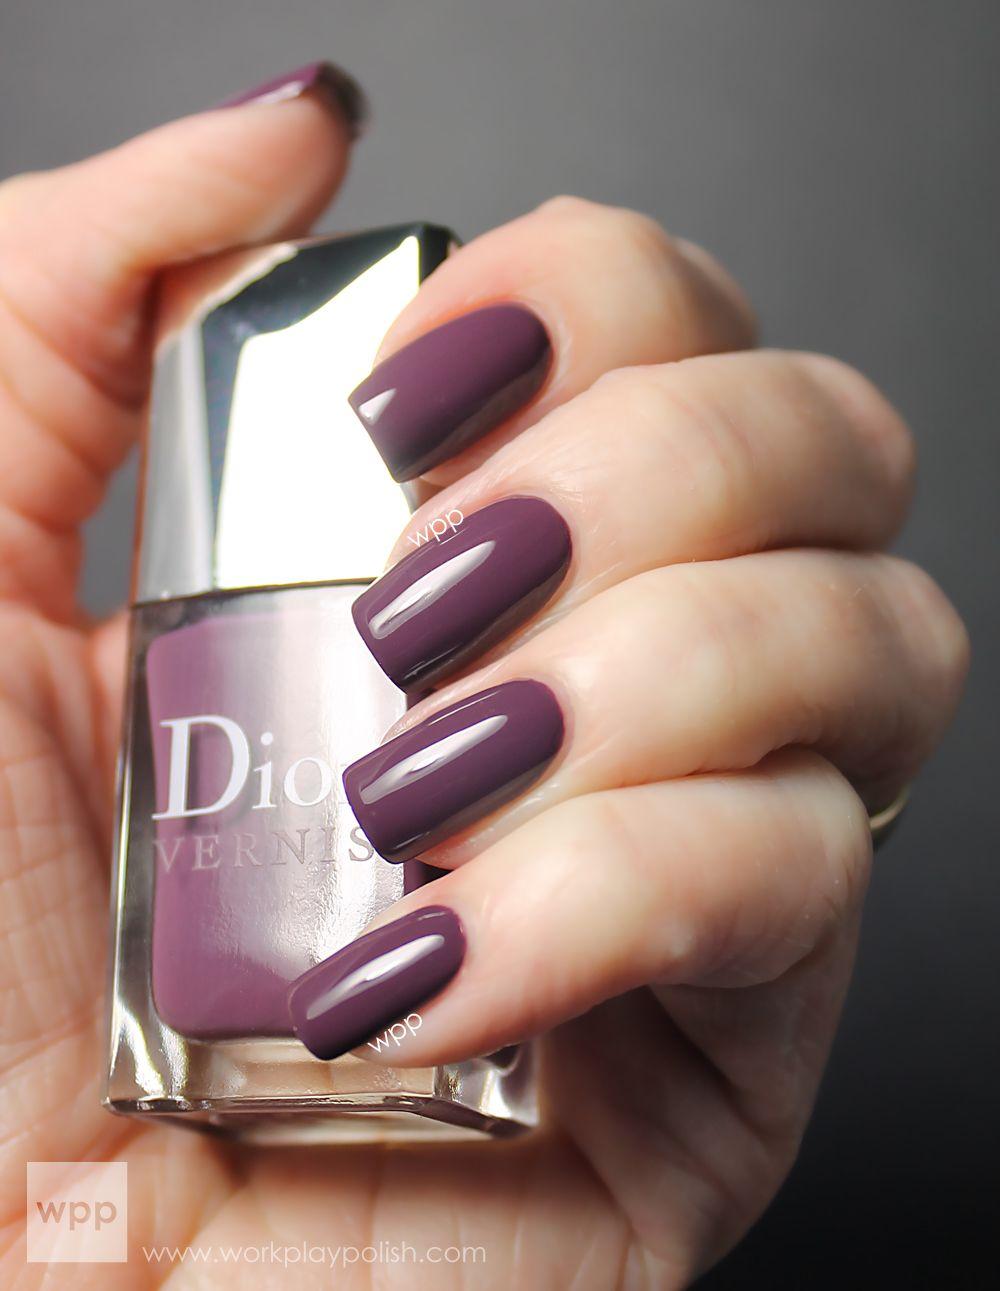 Dior Vernis (887) Purple Mix (work / play / polish) | Nail Polish ...